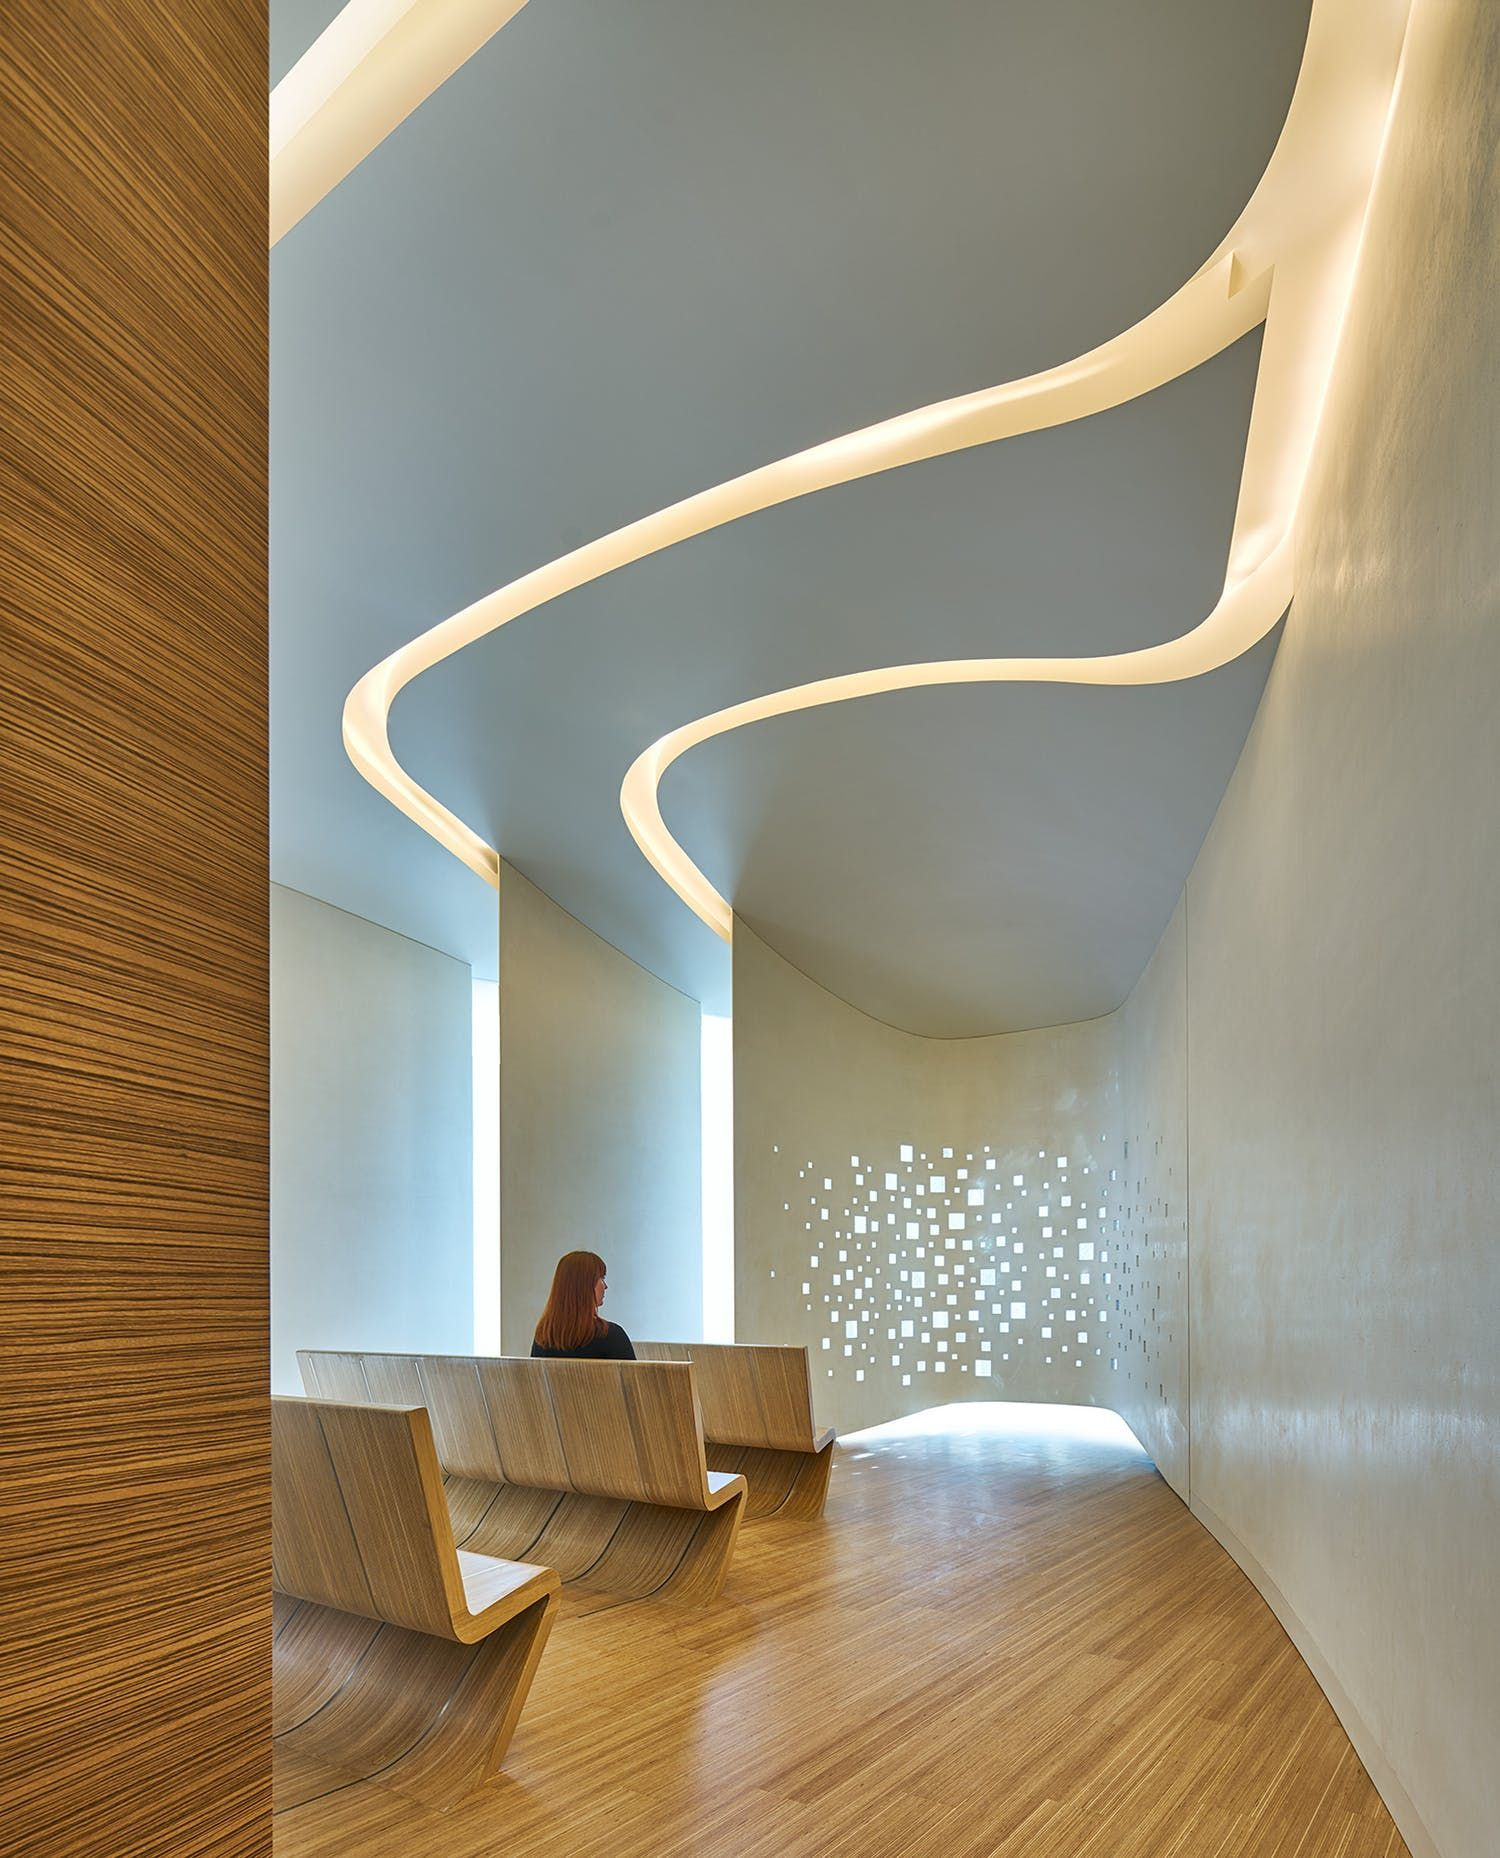 Yazdani Studio Of Cannon Design Is Hiring Architectural Designer